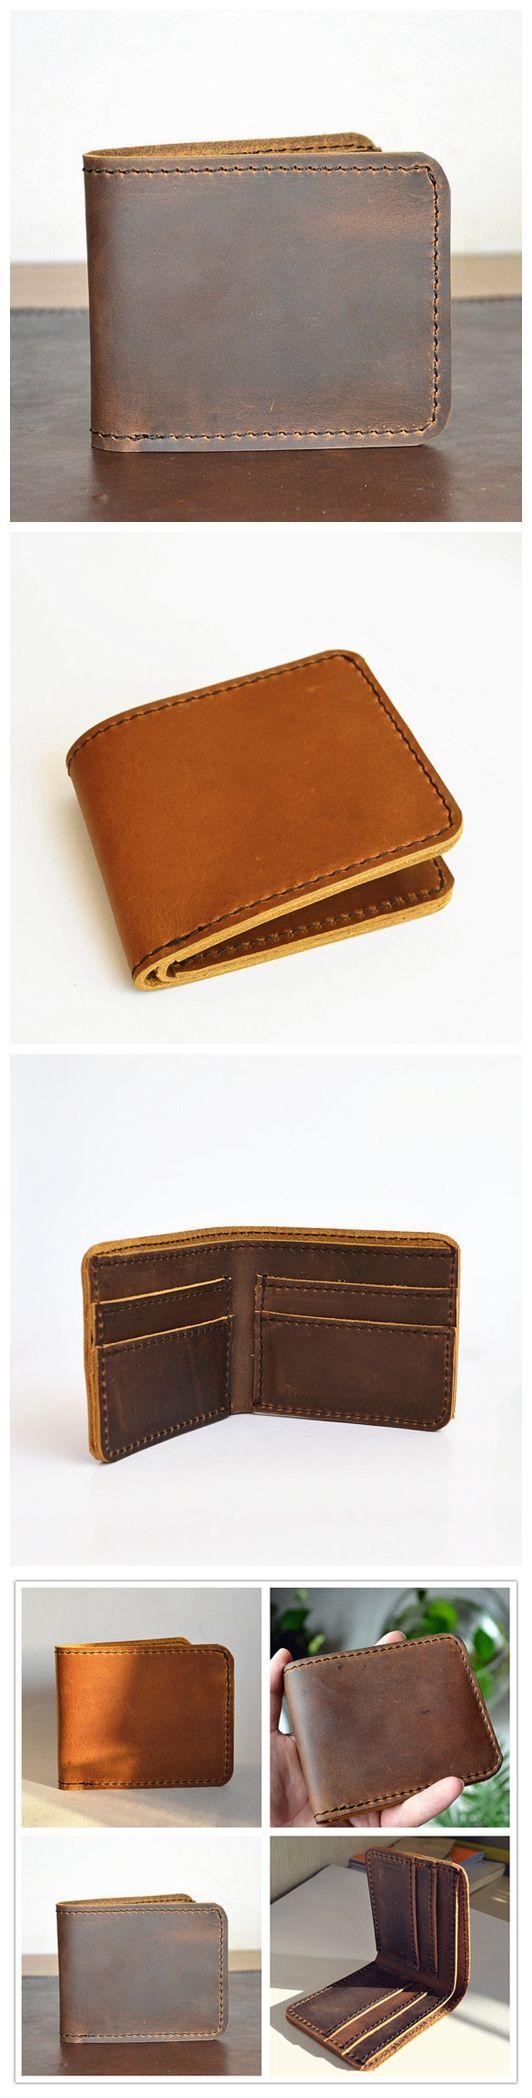 Top Handmade Mens Leather Wallet Men Womens Leather Wallet Women Leather Bifold Wallet Mens Bifold Wallet Mens Wallet Bifold Leather Wallet